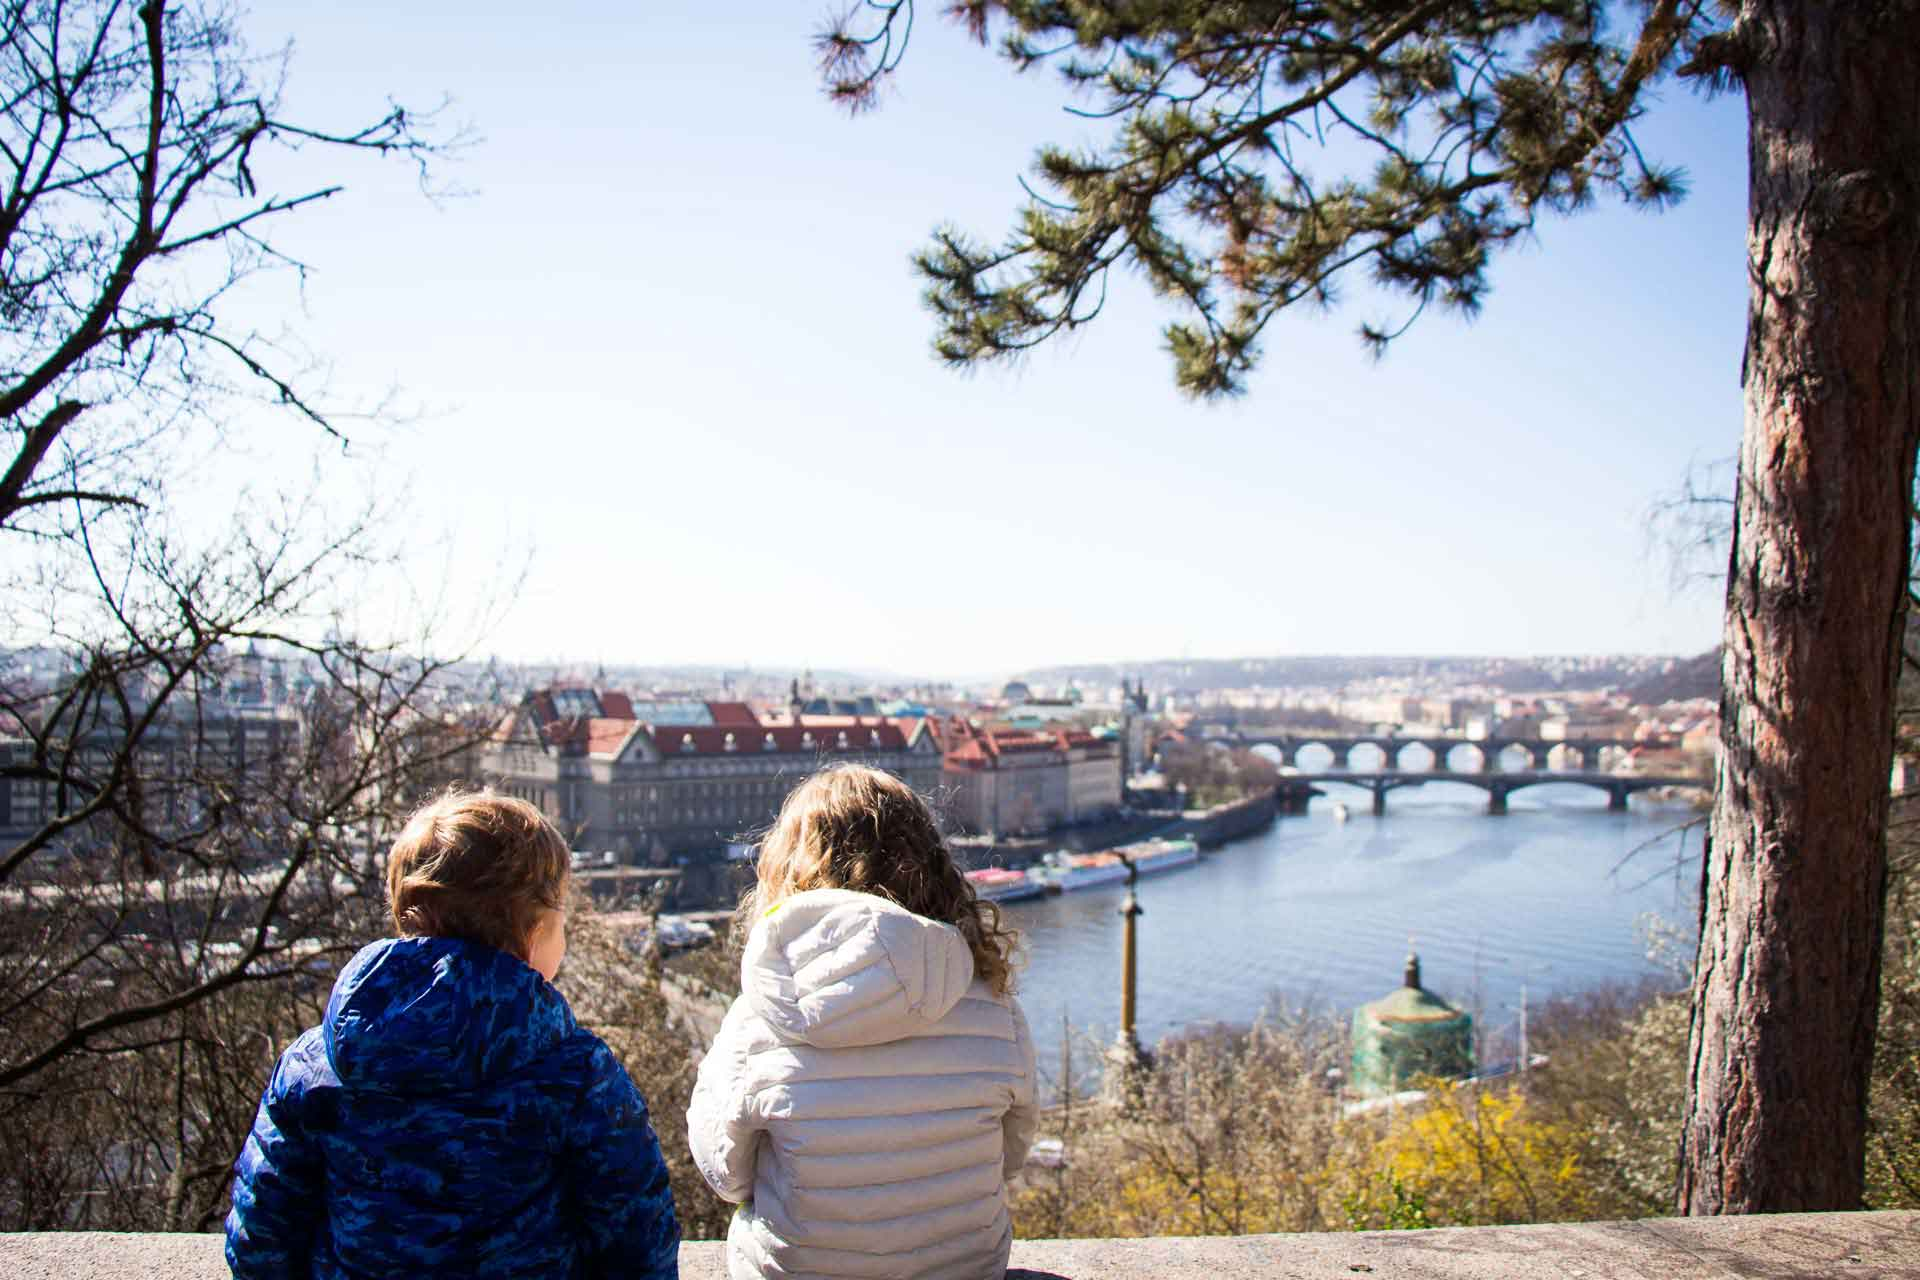 Letna Park - Prague Family Friendly Walks